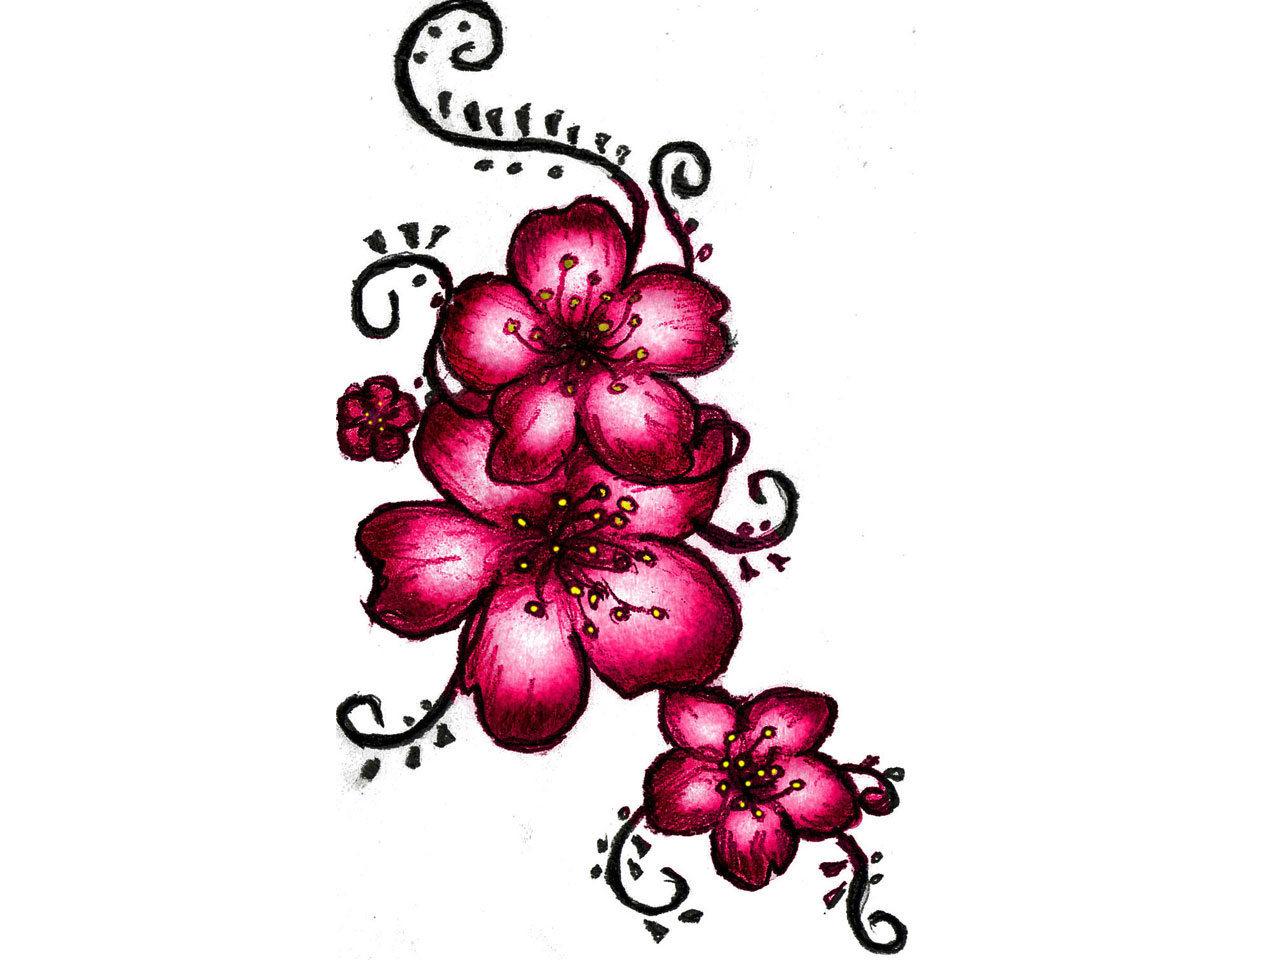 Drawn sakura blossom tribal Images Tribal to Photos All